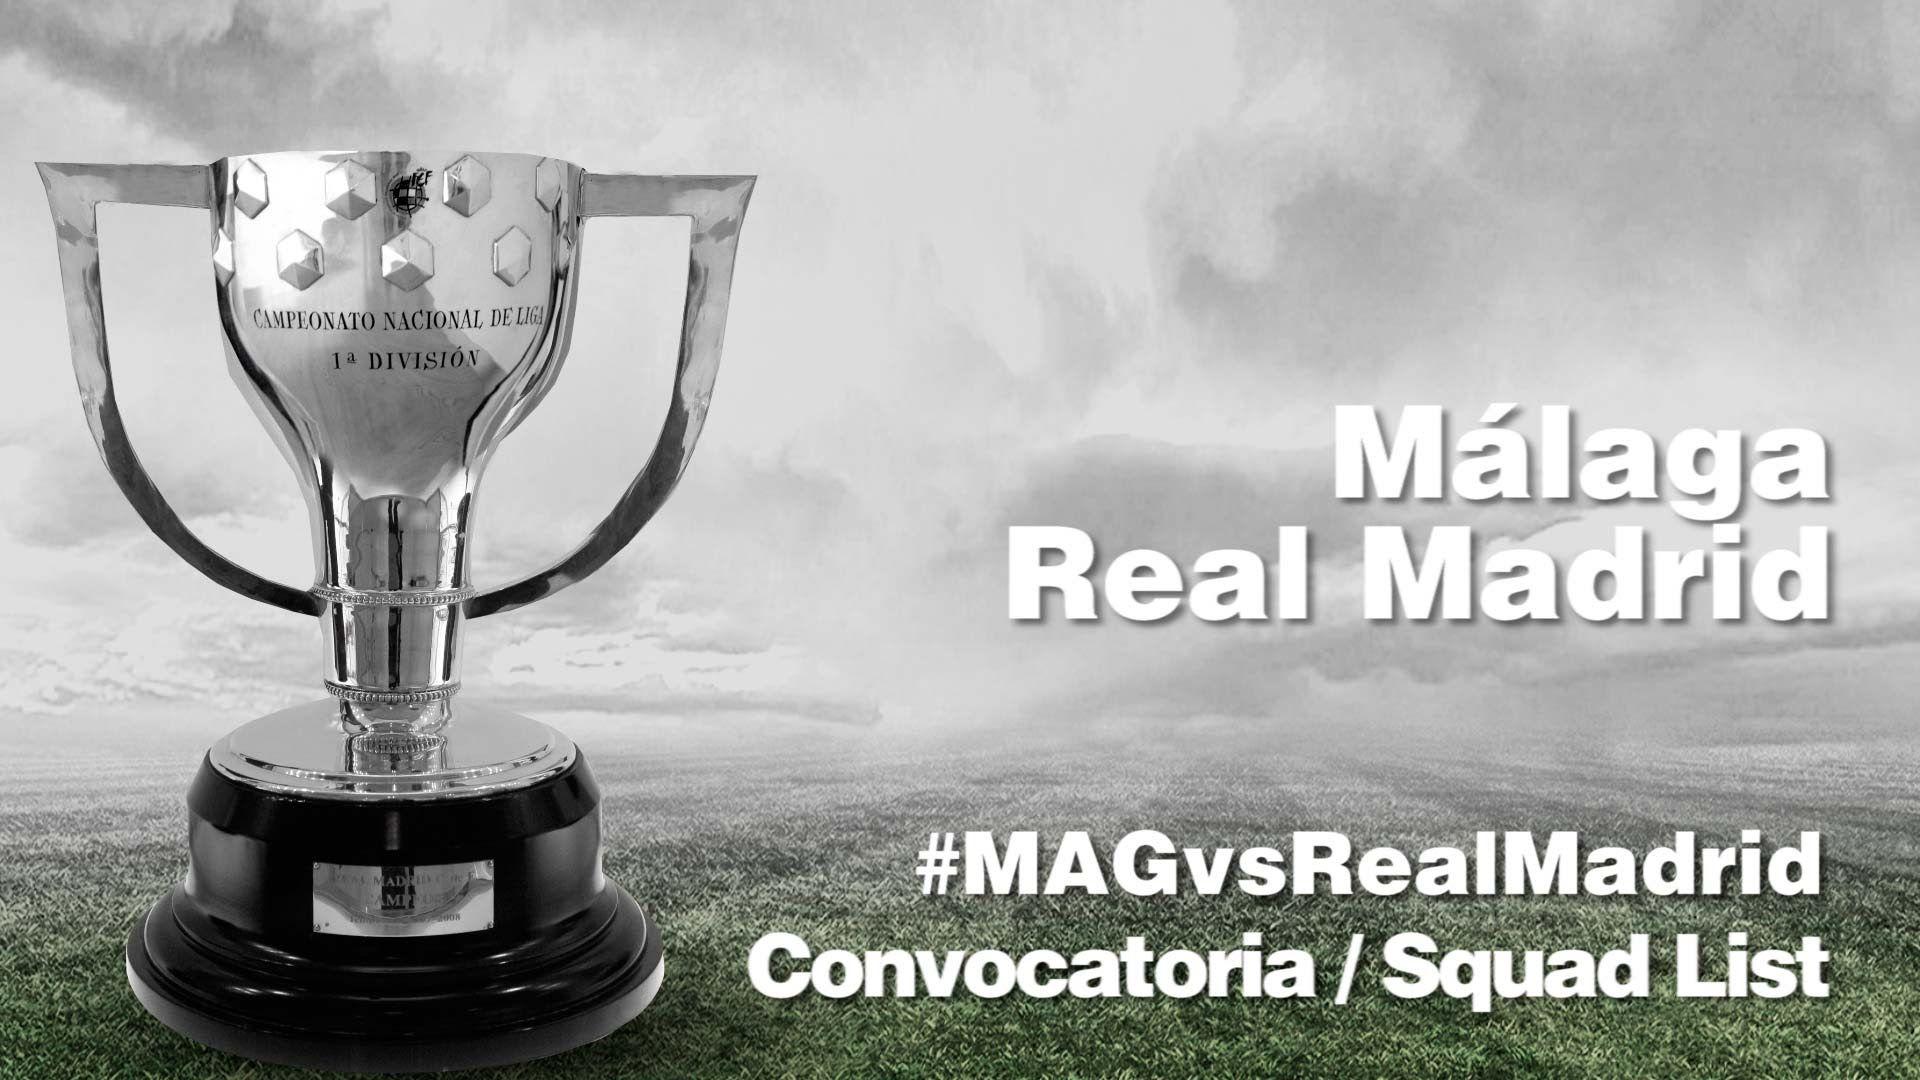 CONVOCATORIA / SQUAD LIST: Málaga - Real Madrid